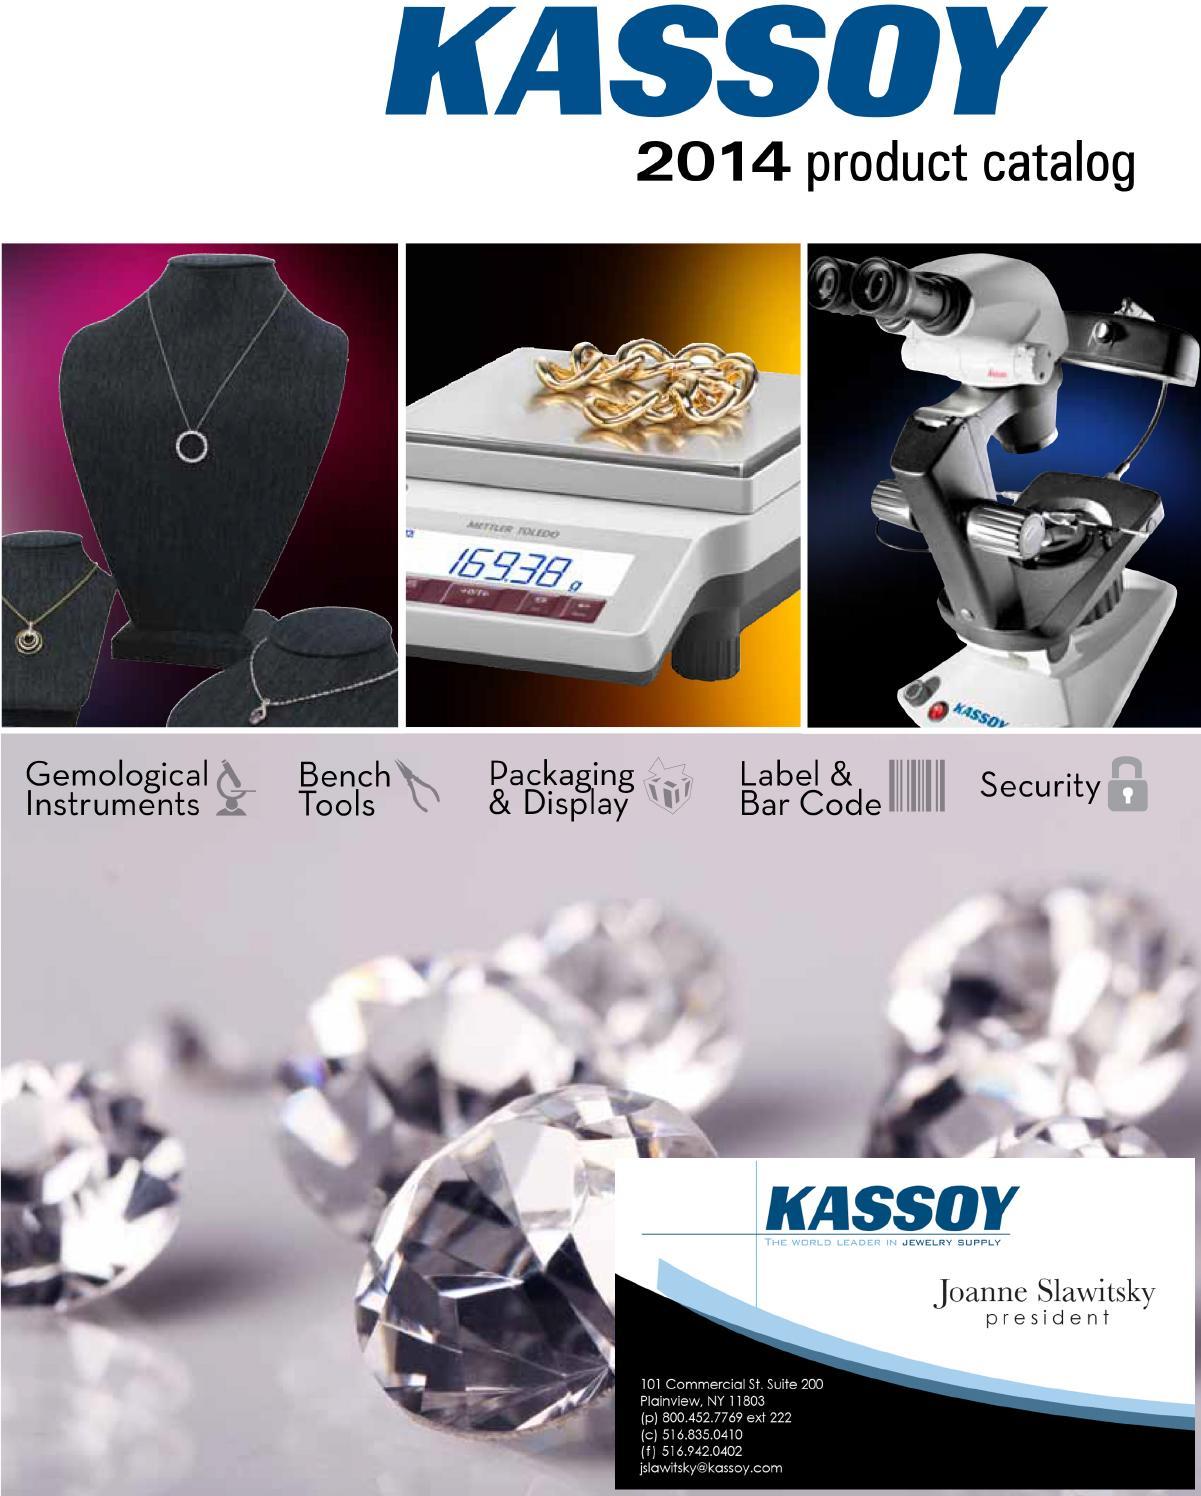 68C-BK 26 Hook Pendant Pad w// Easel Black Velvet Jewelry Display Pawn Shop